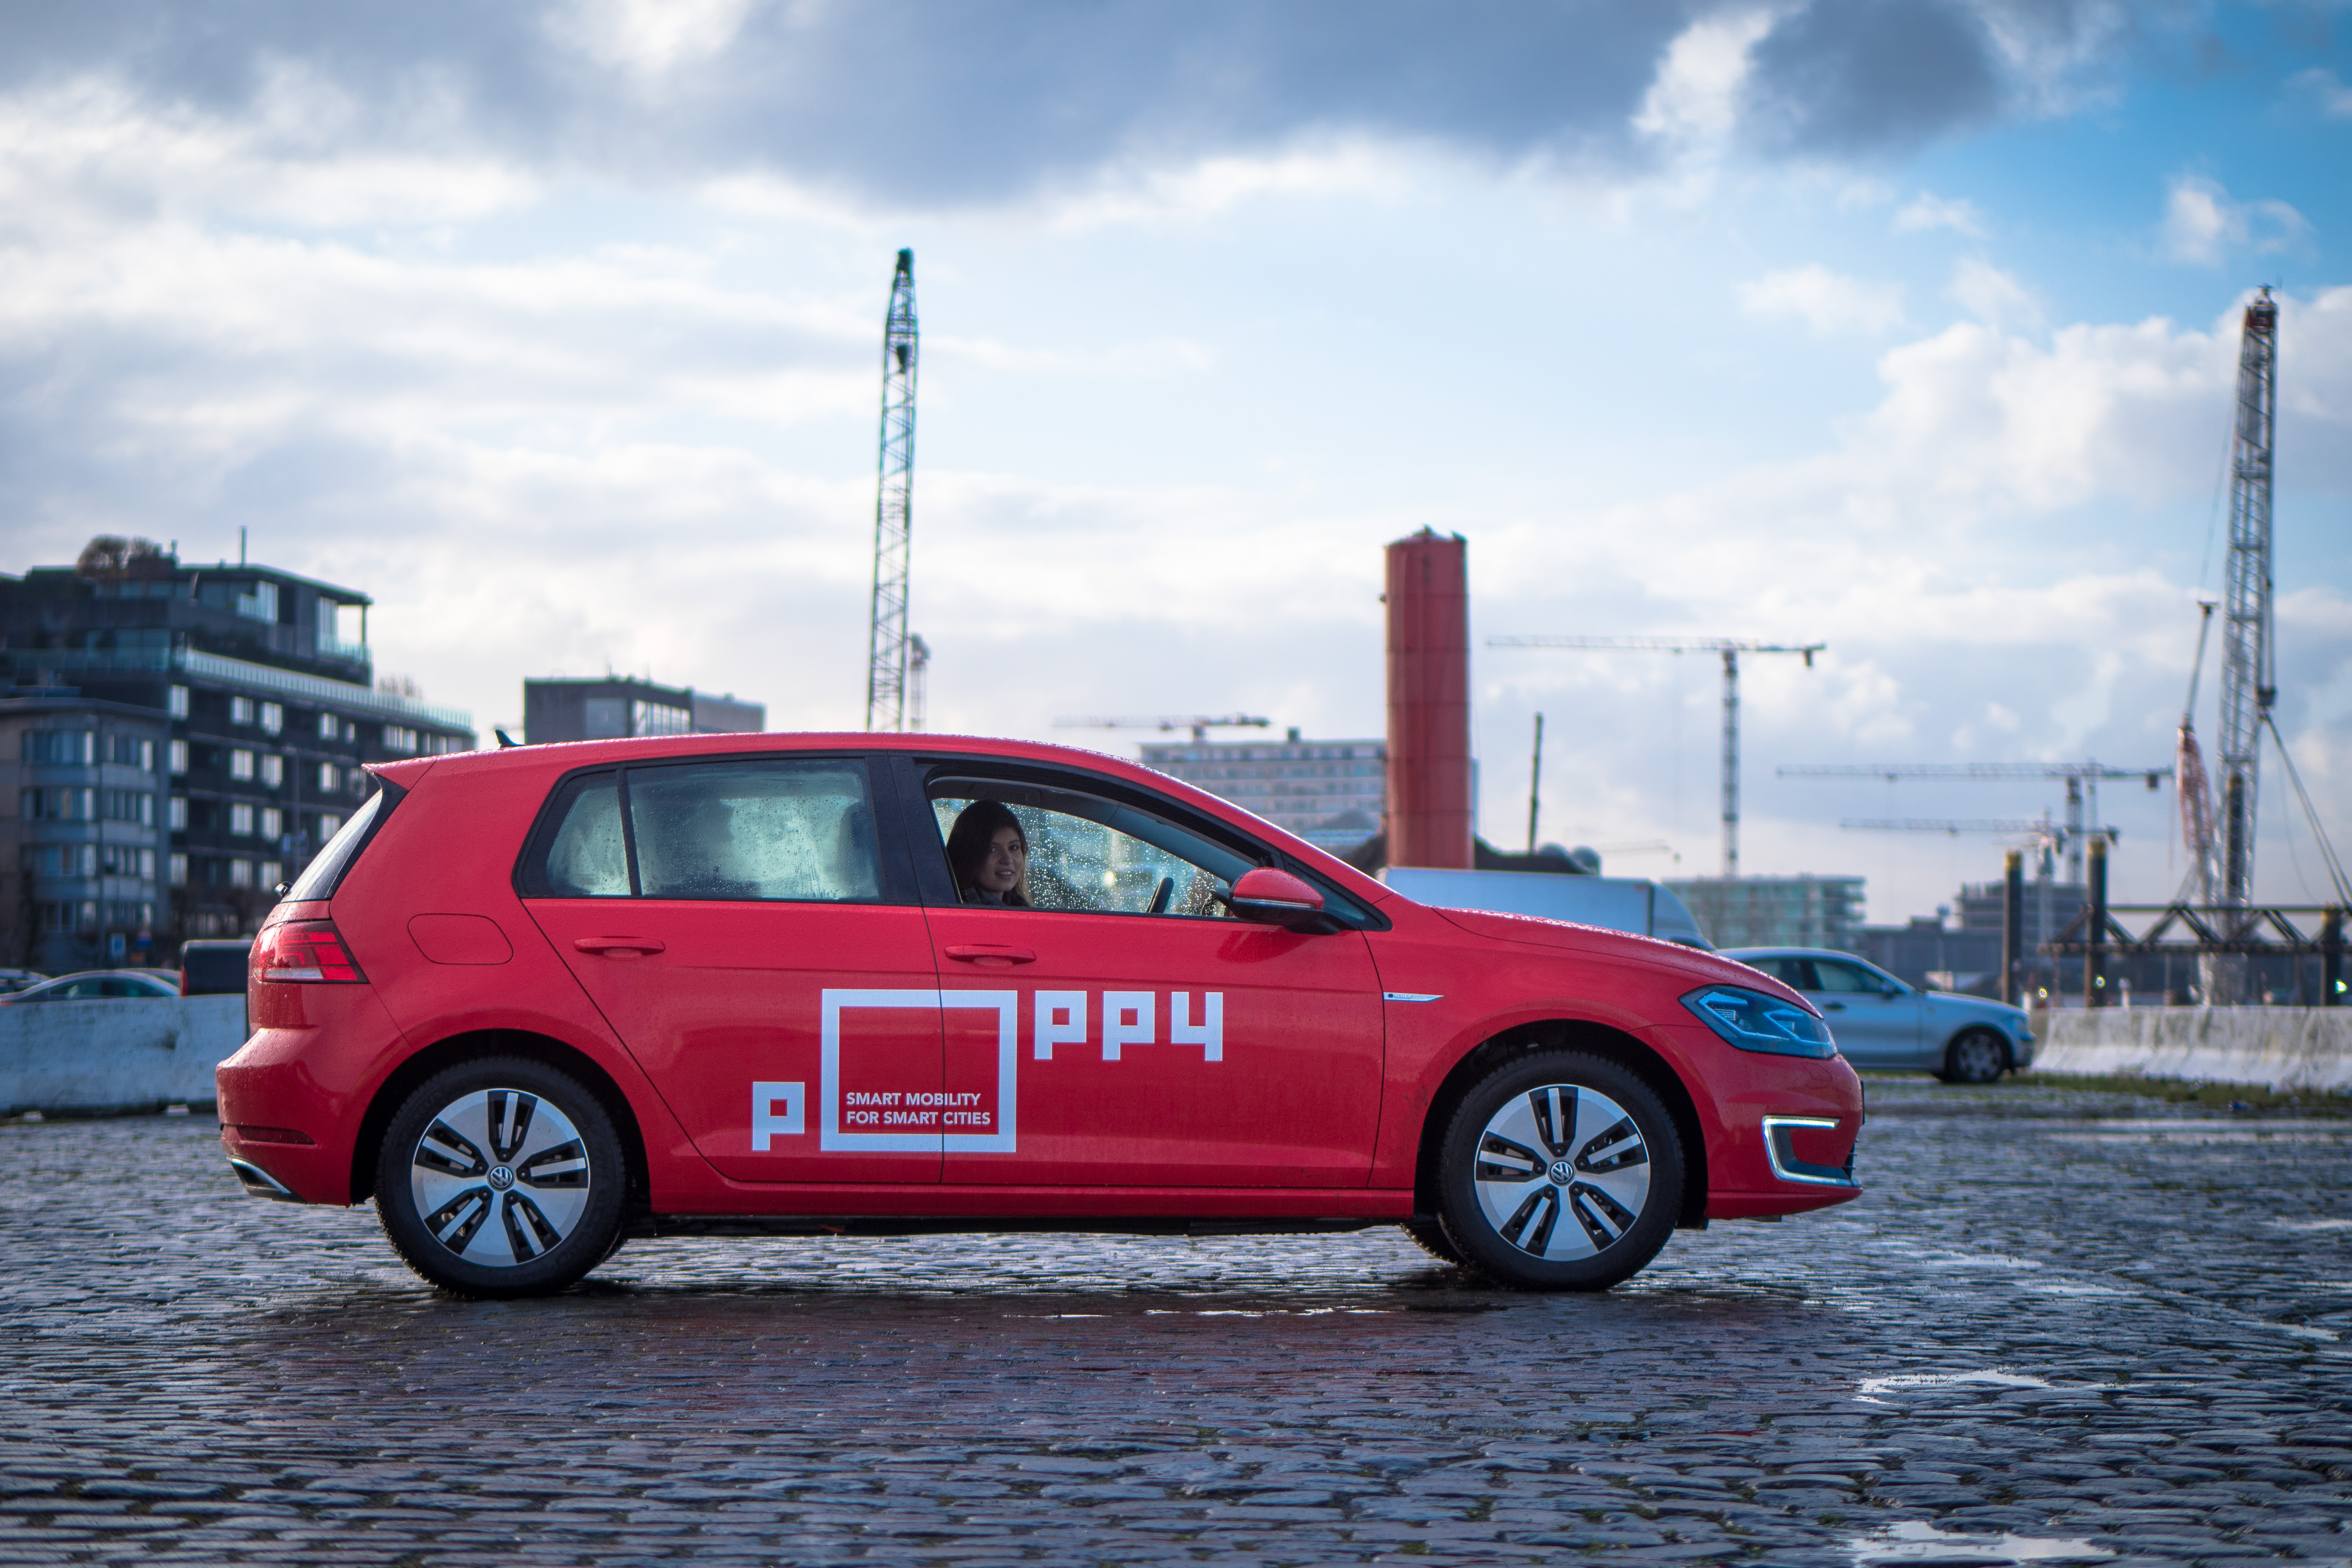 Poppy, car sharing, branding